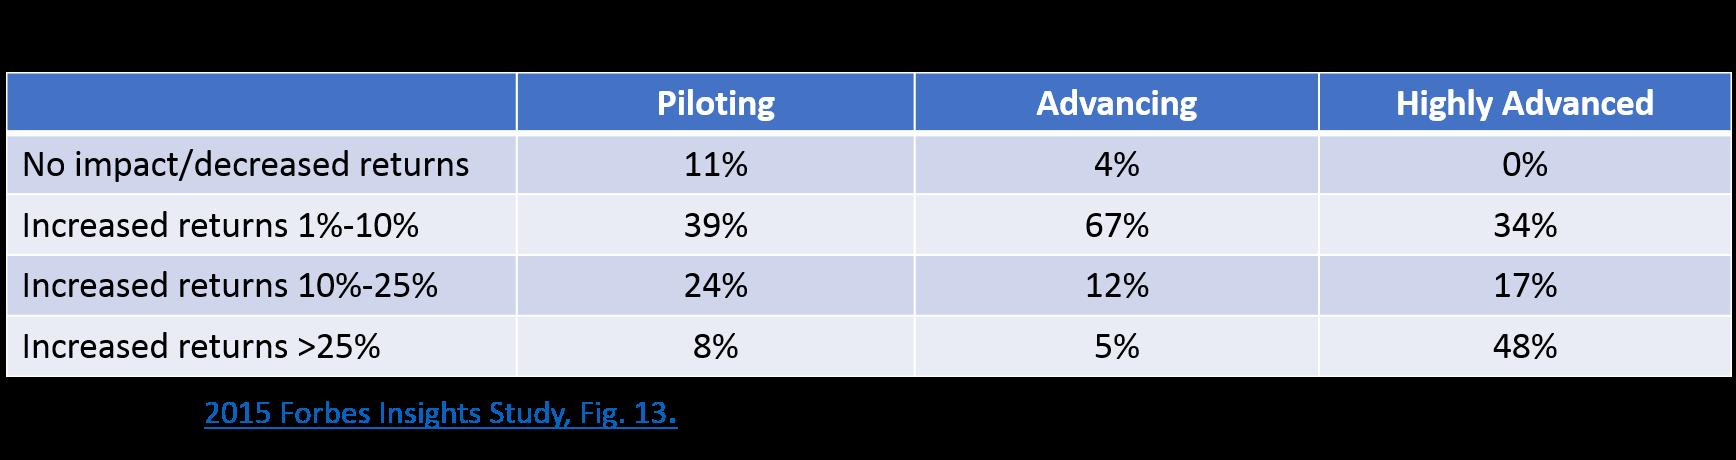 Predictive_Marketing_ROI_Table.png